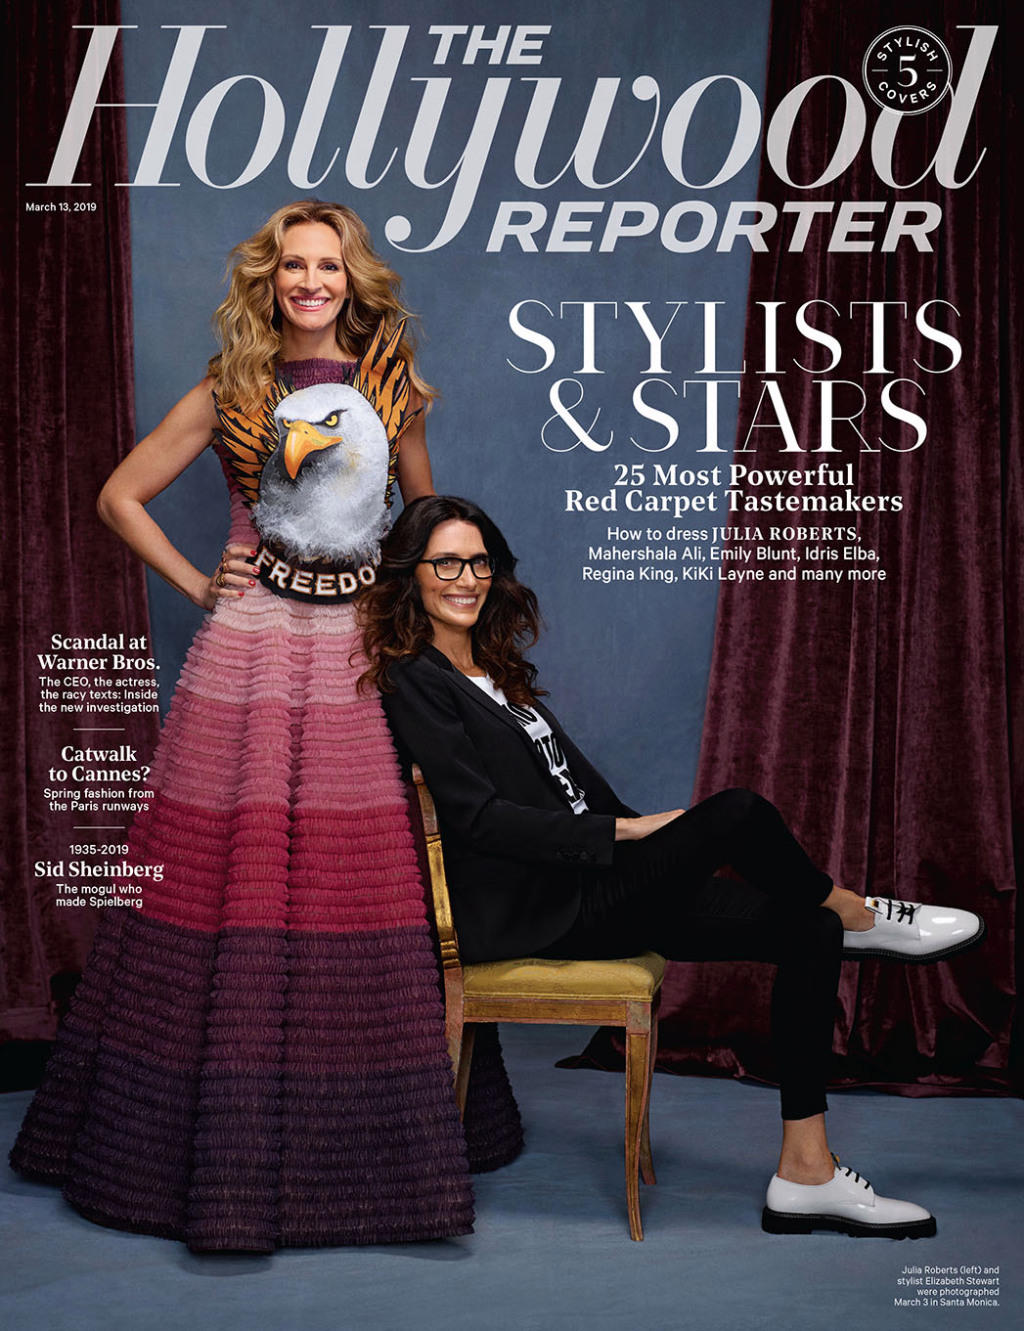 thr_issue_10_julia_roberts_elizabeth_stewart_stylists_cover